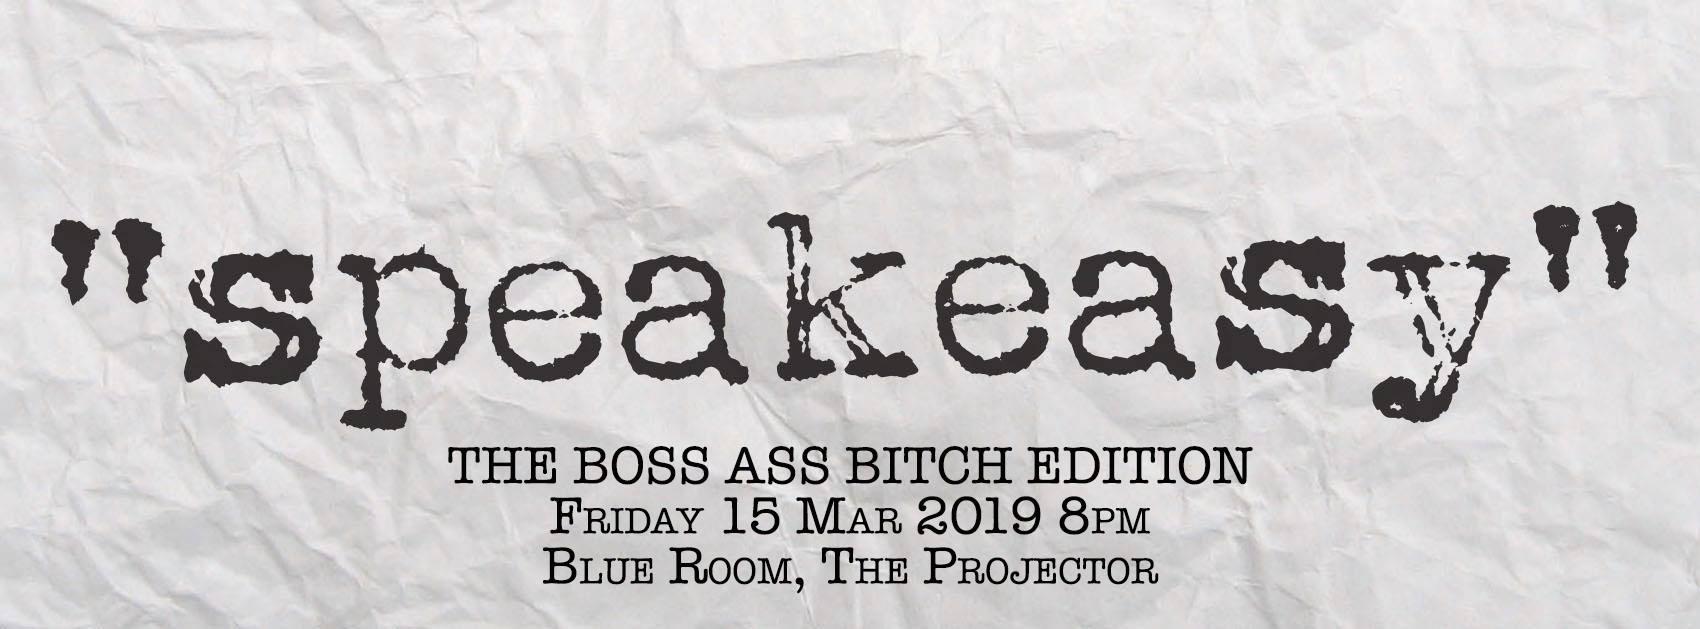 speakeasy boss ass bitch edition deborah emmanuel